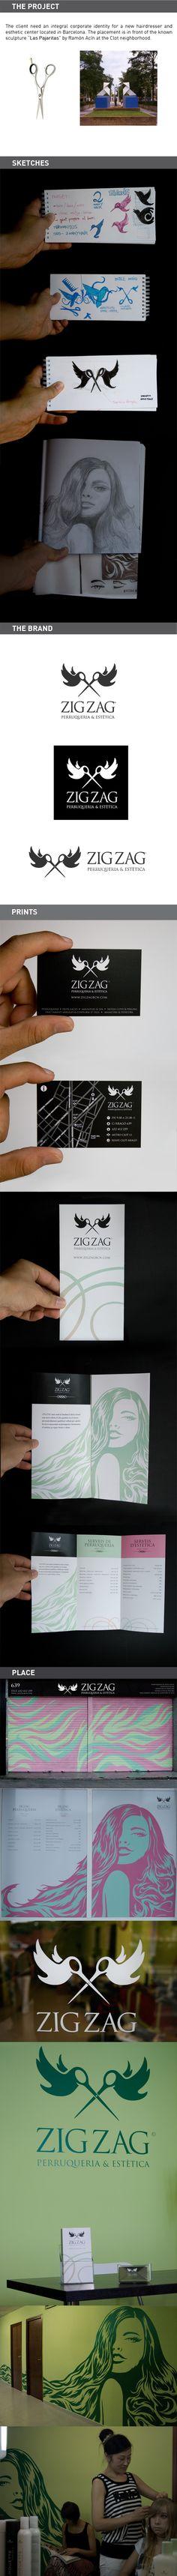 ZIG ZAG / Branding by Roger Haus